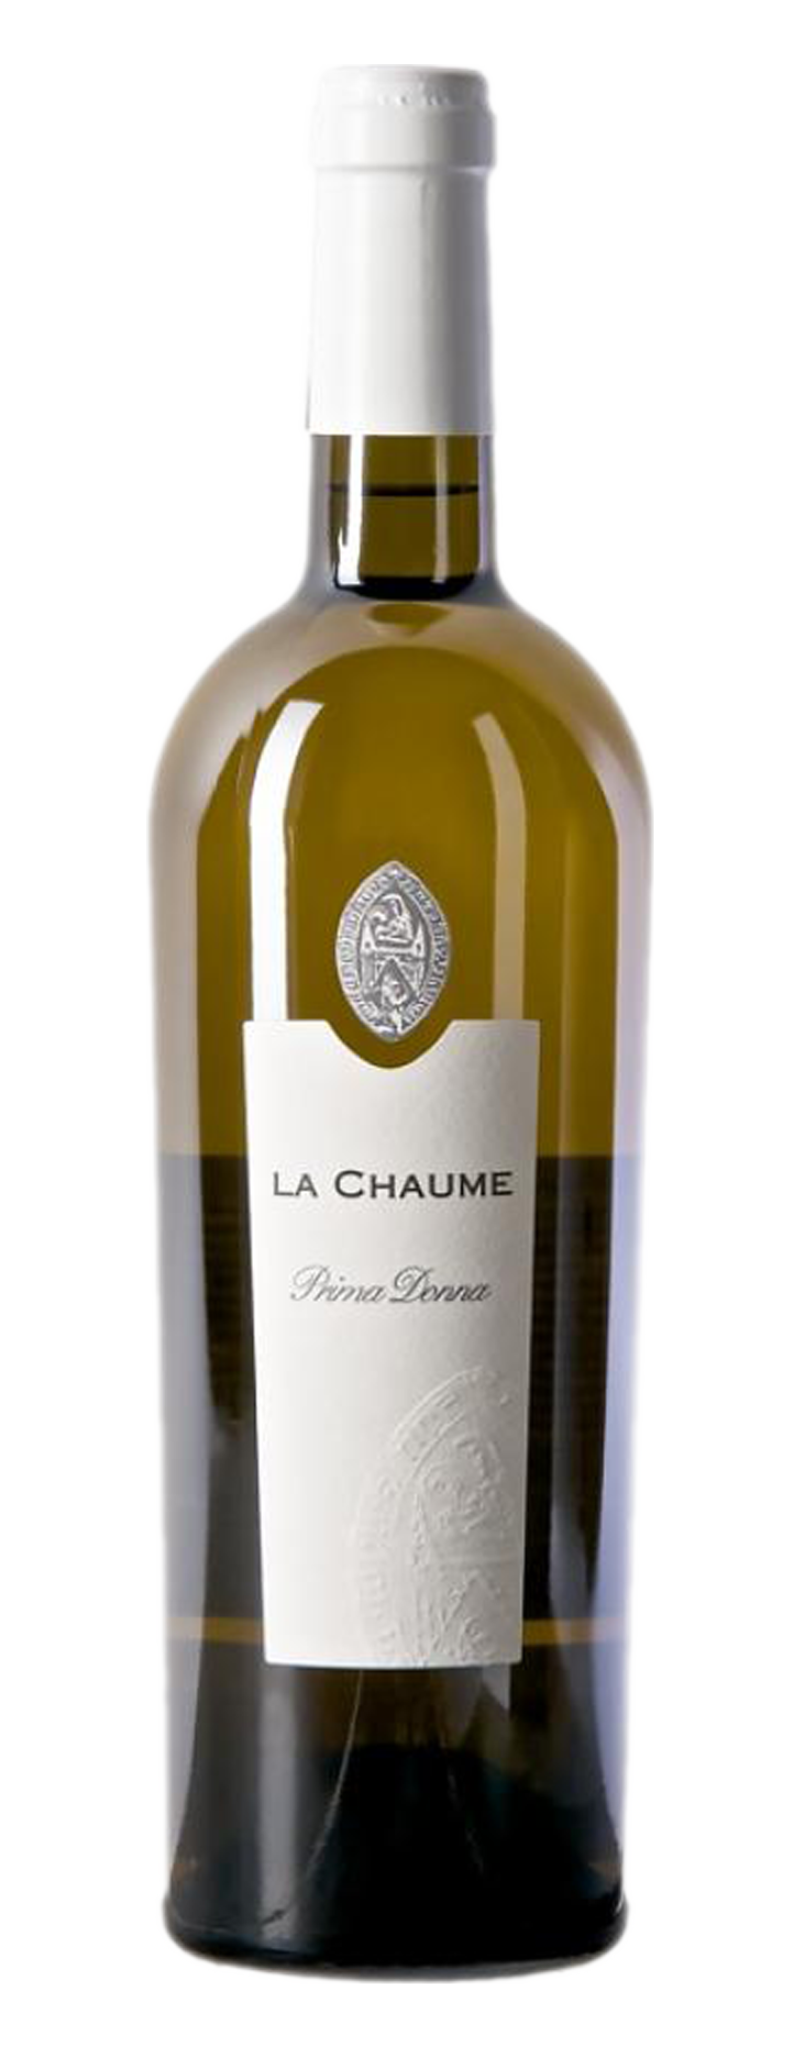 La Chaume Prima Donna - Vendée  - 750ml